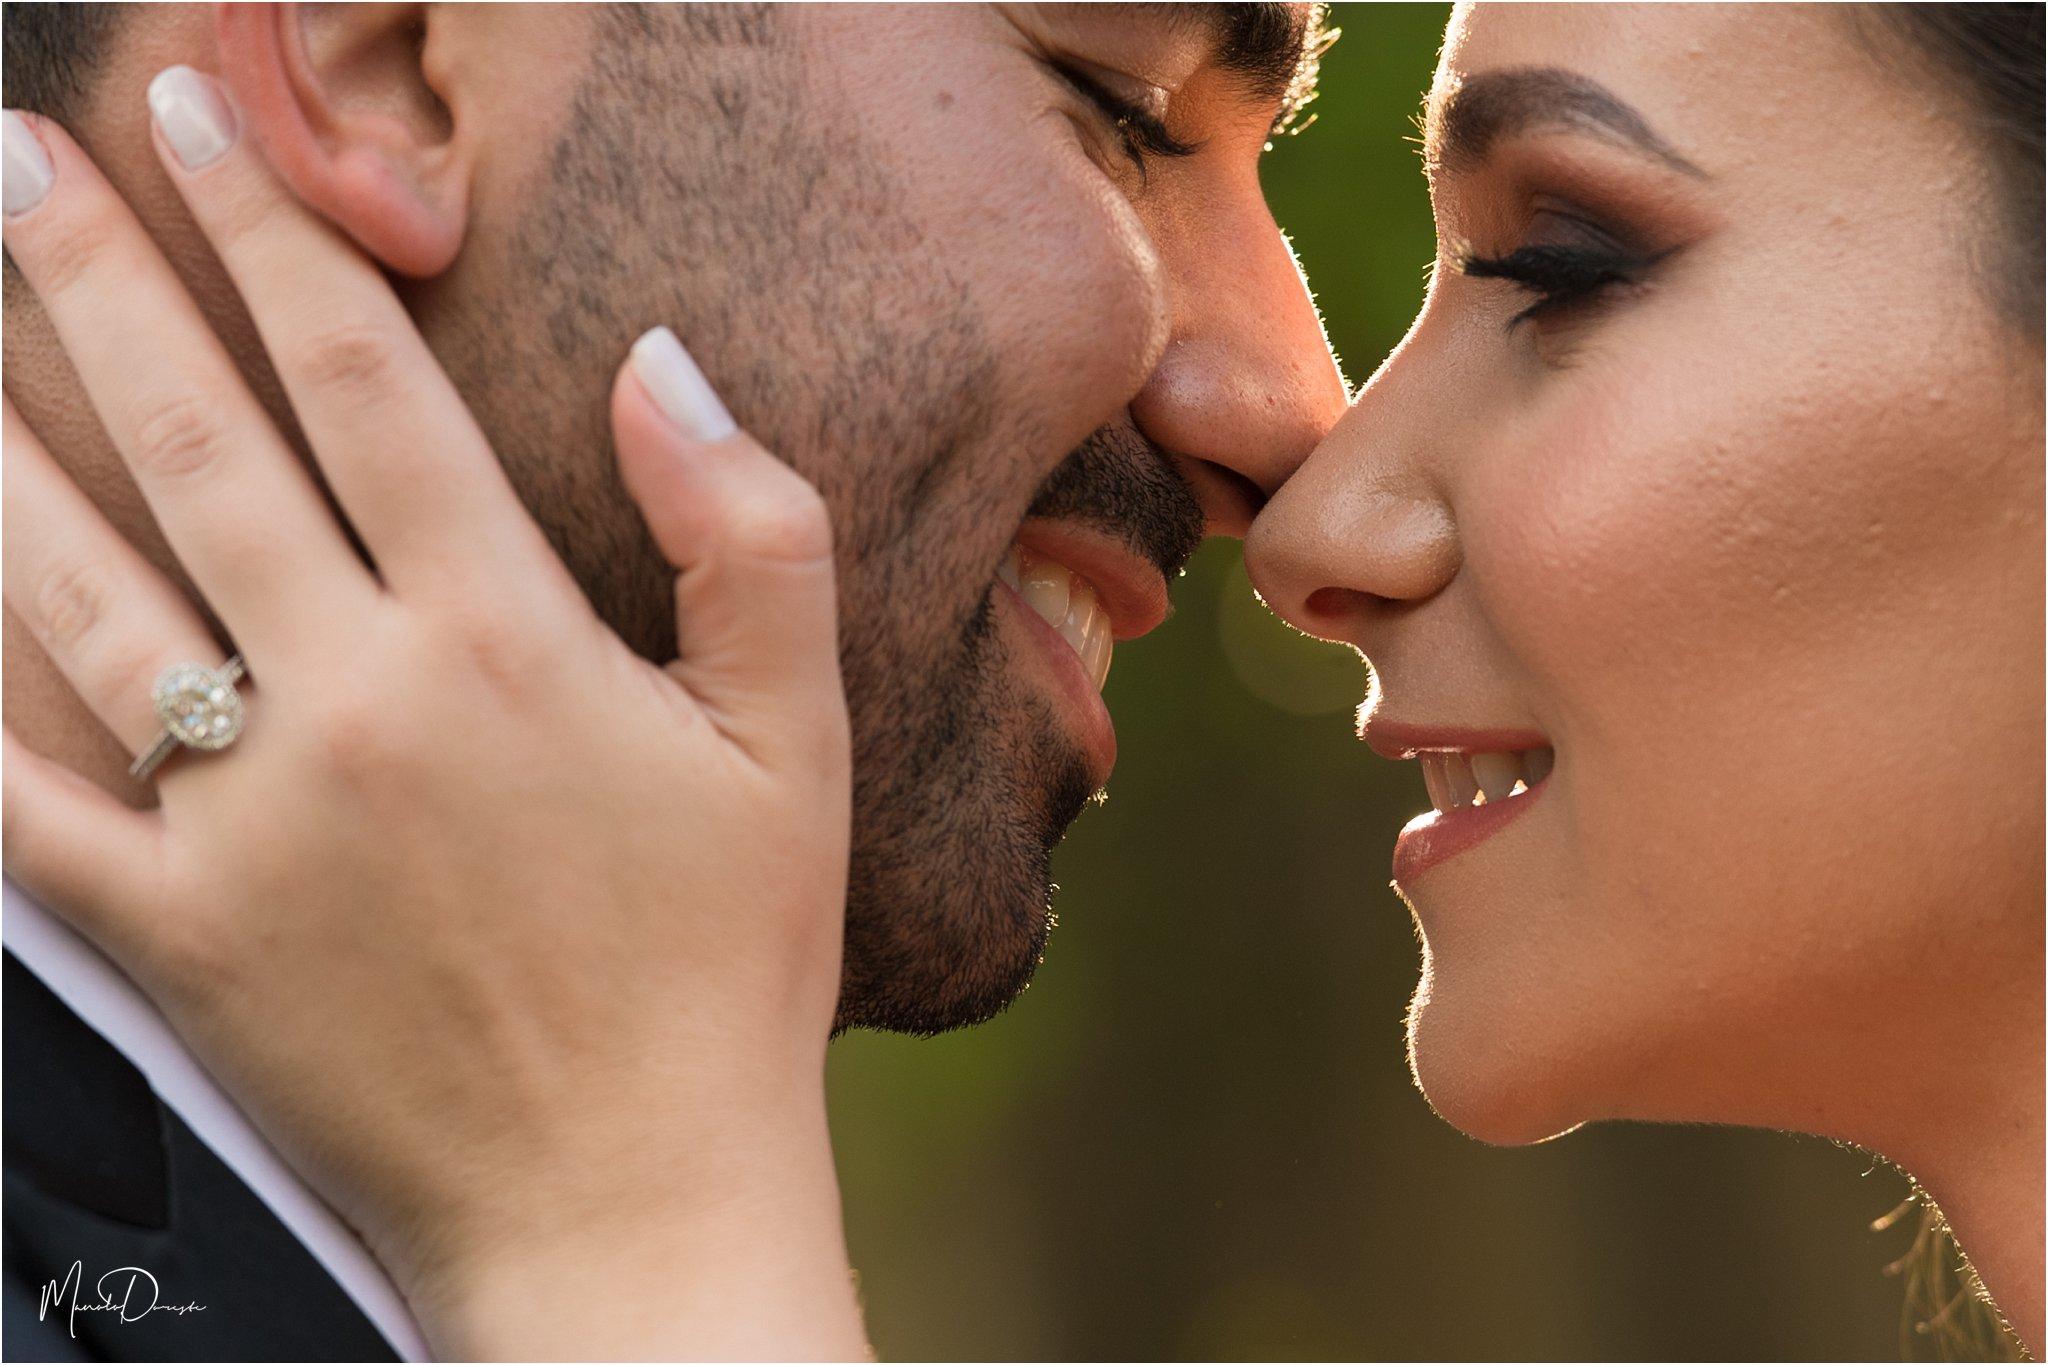 00816_ManoloDoreste_InFocusStudios_Wedding_Family_Photography_Miami_MiamiPhotographer.jpg